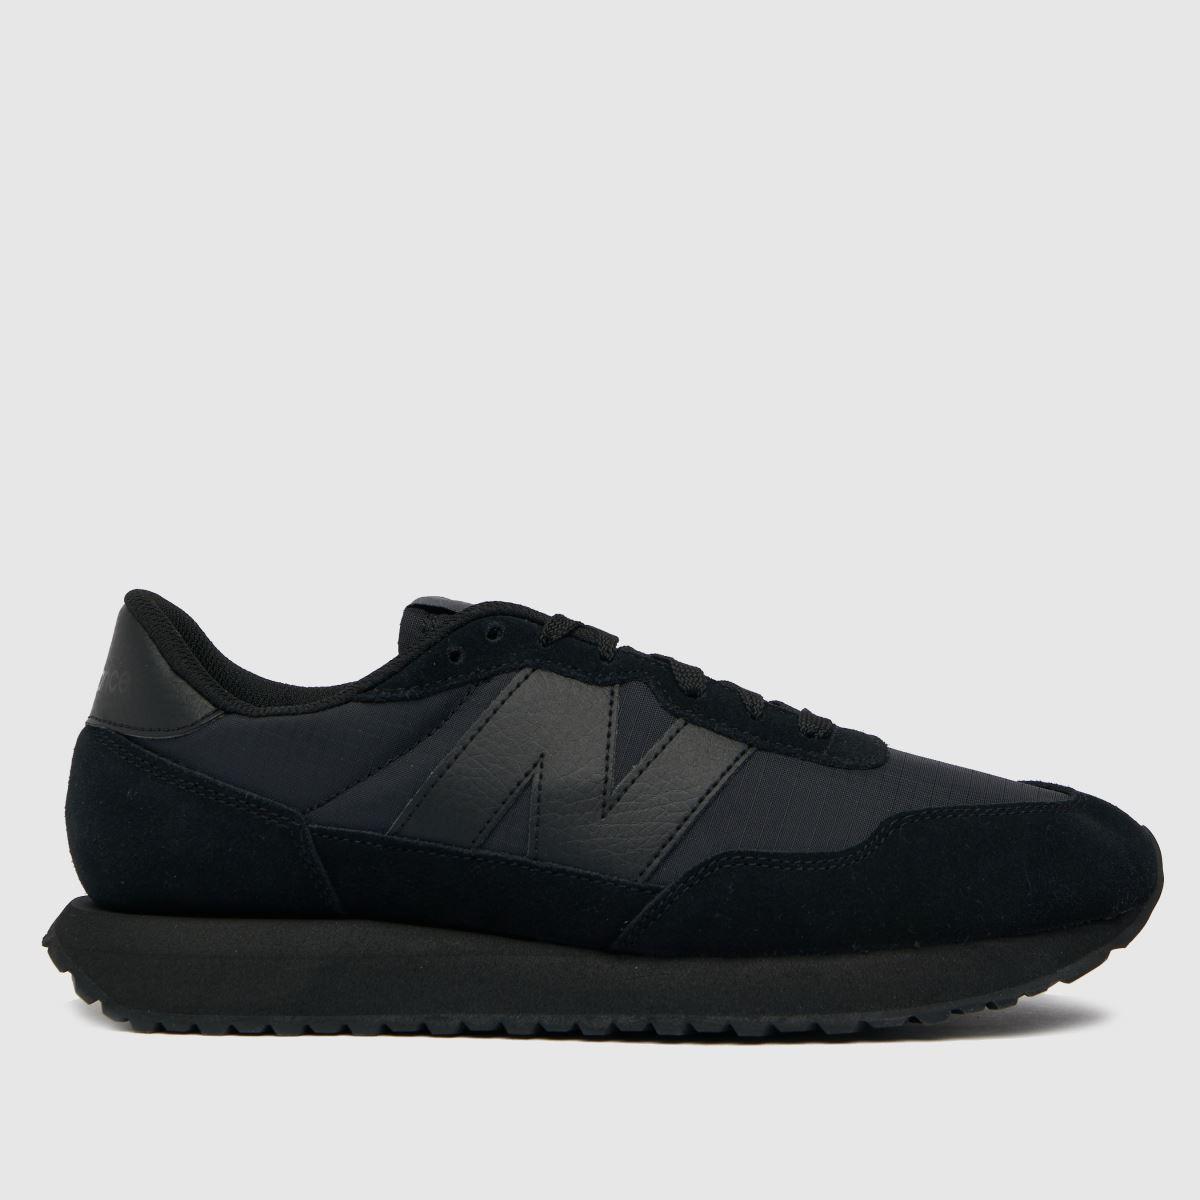 New Balance Black 237 Trainers